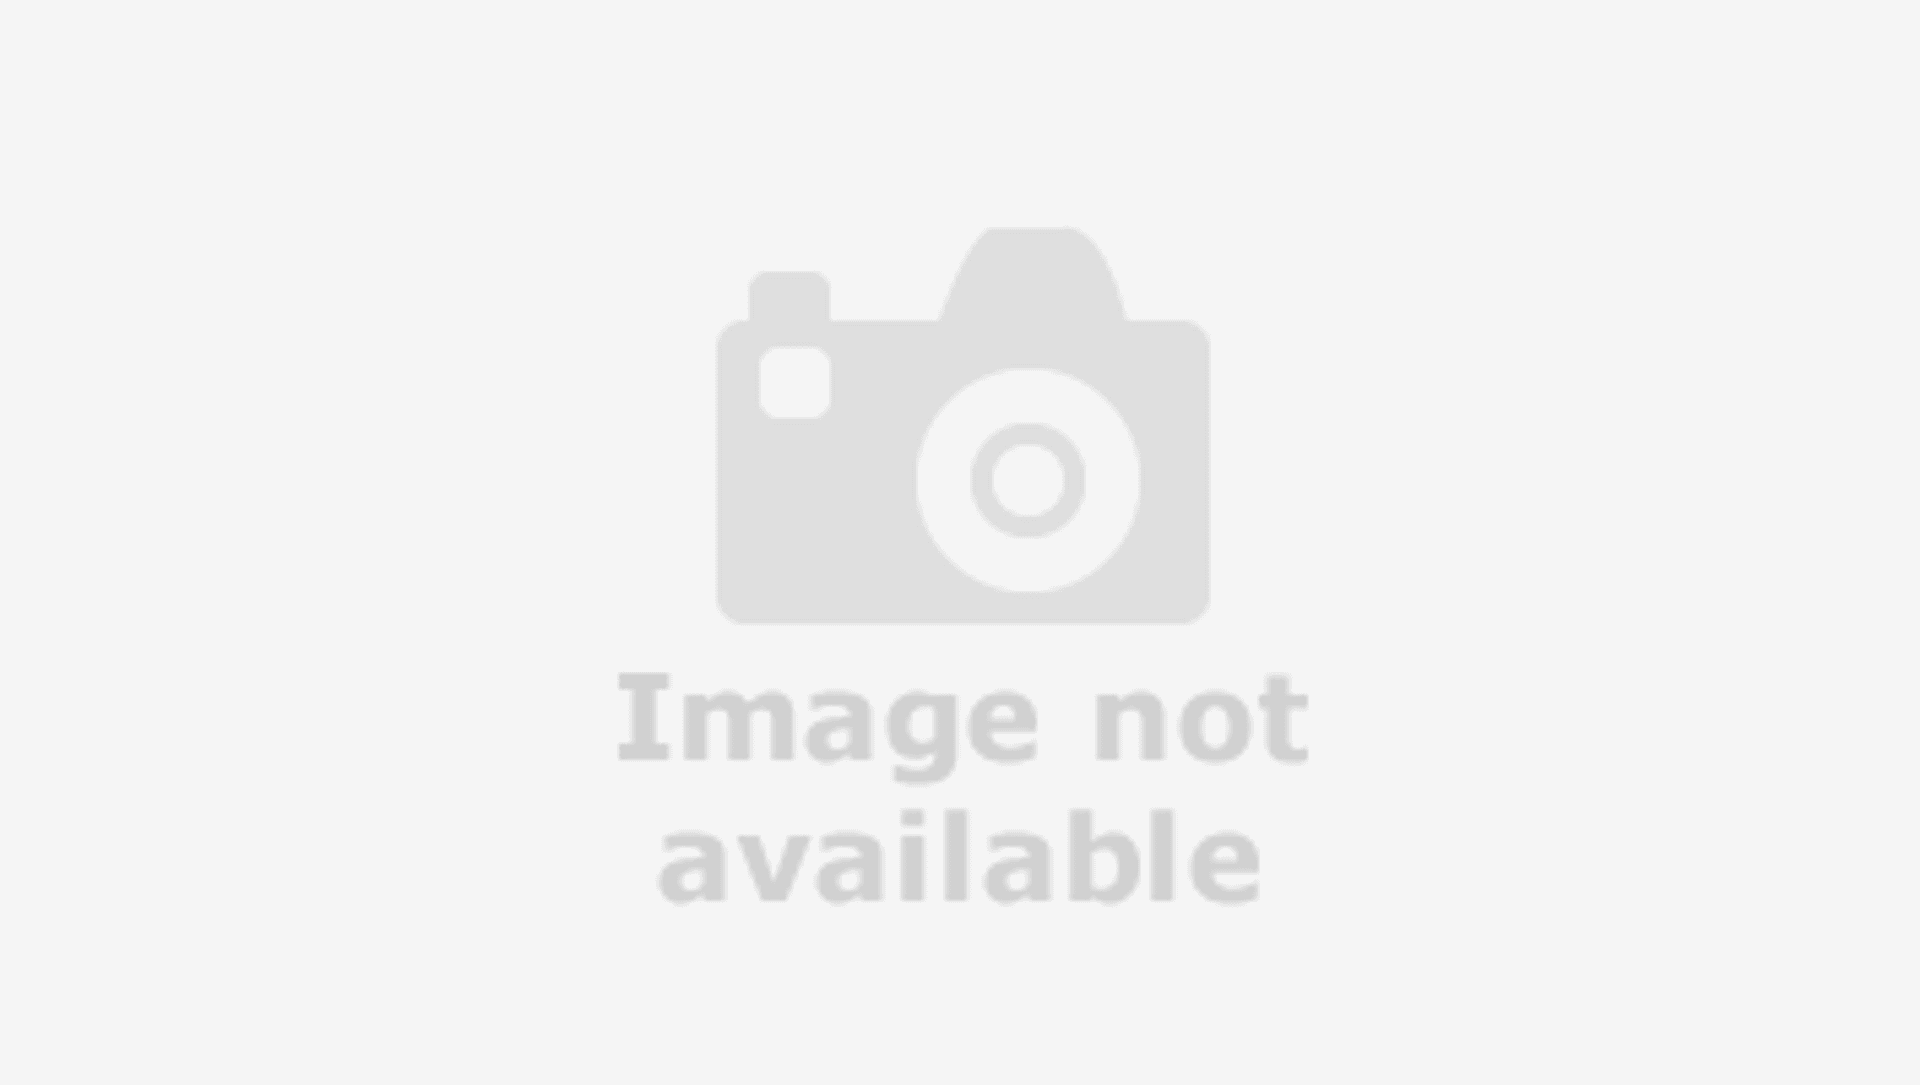 Audi Q5 Vorsprung image